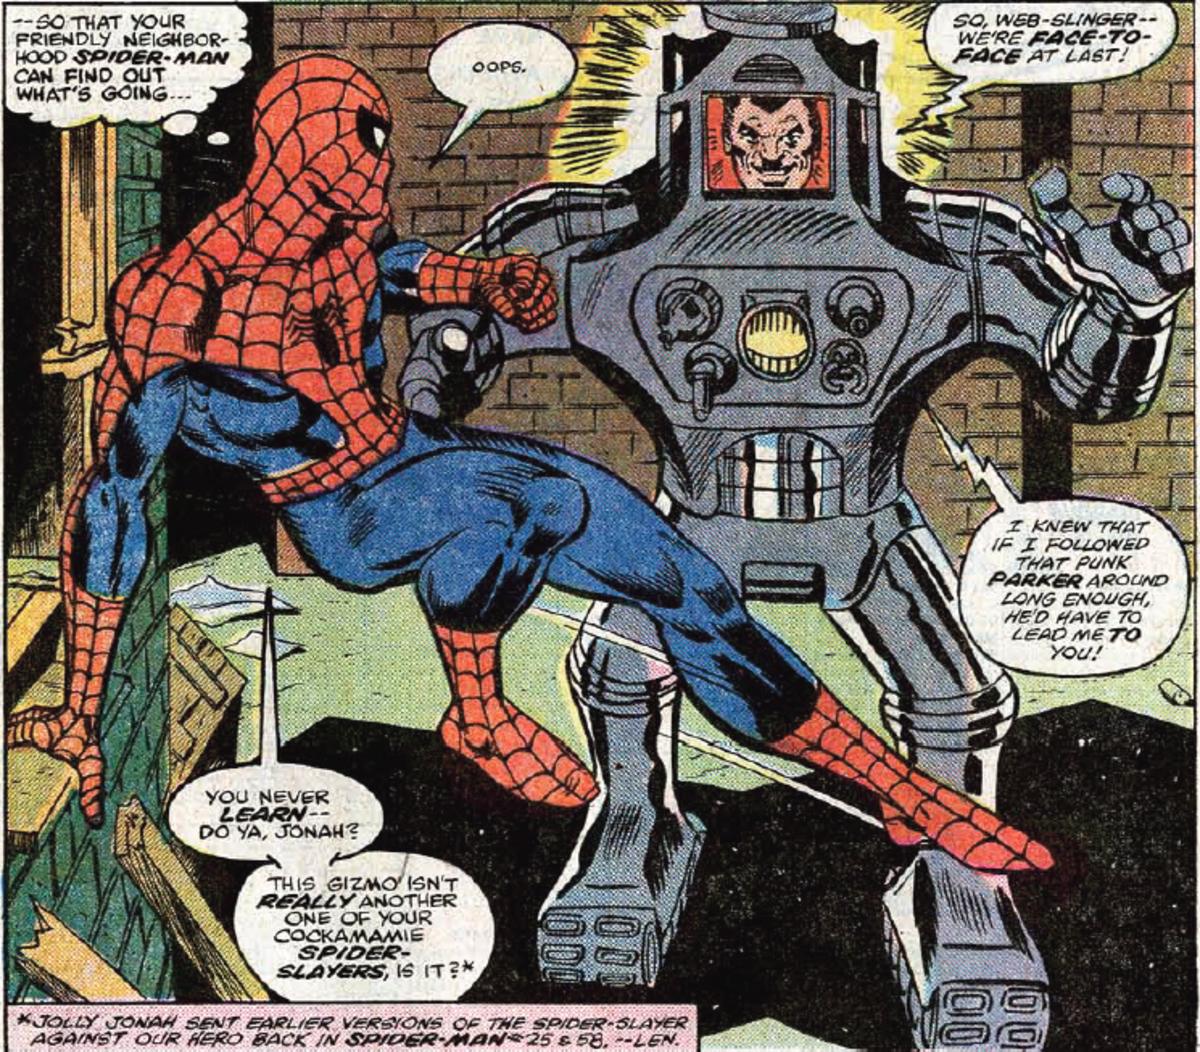 J. Jonah Jameson gets his revenge with a spider-slayer